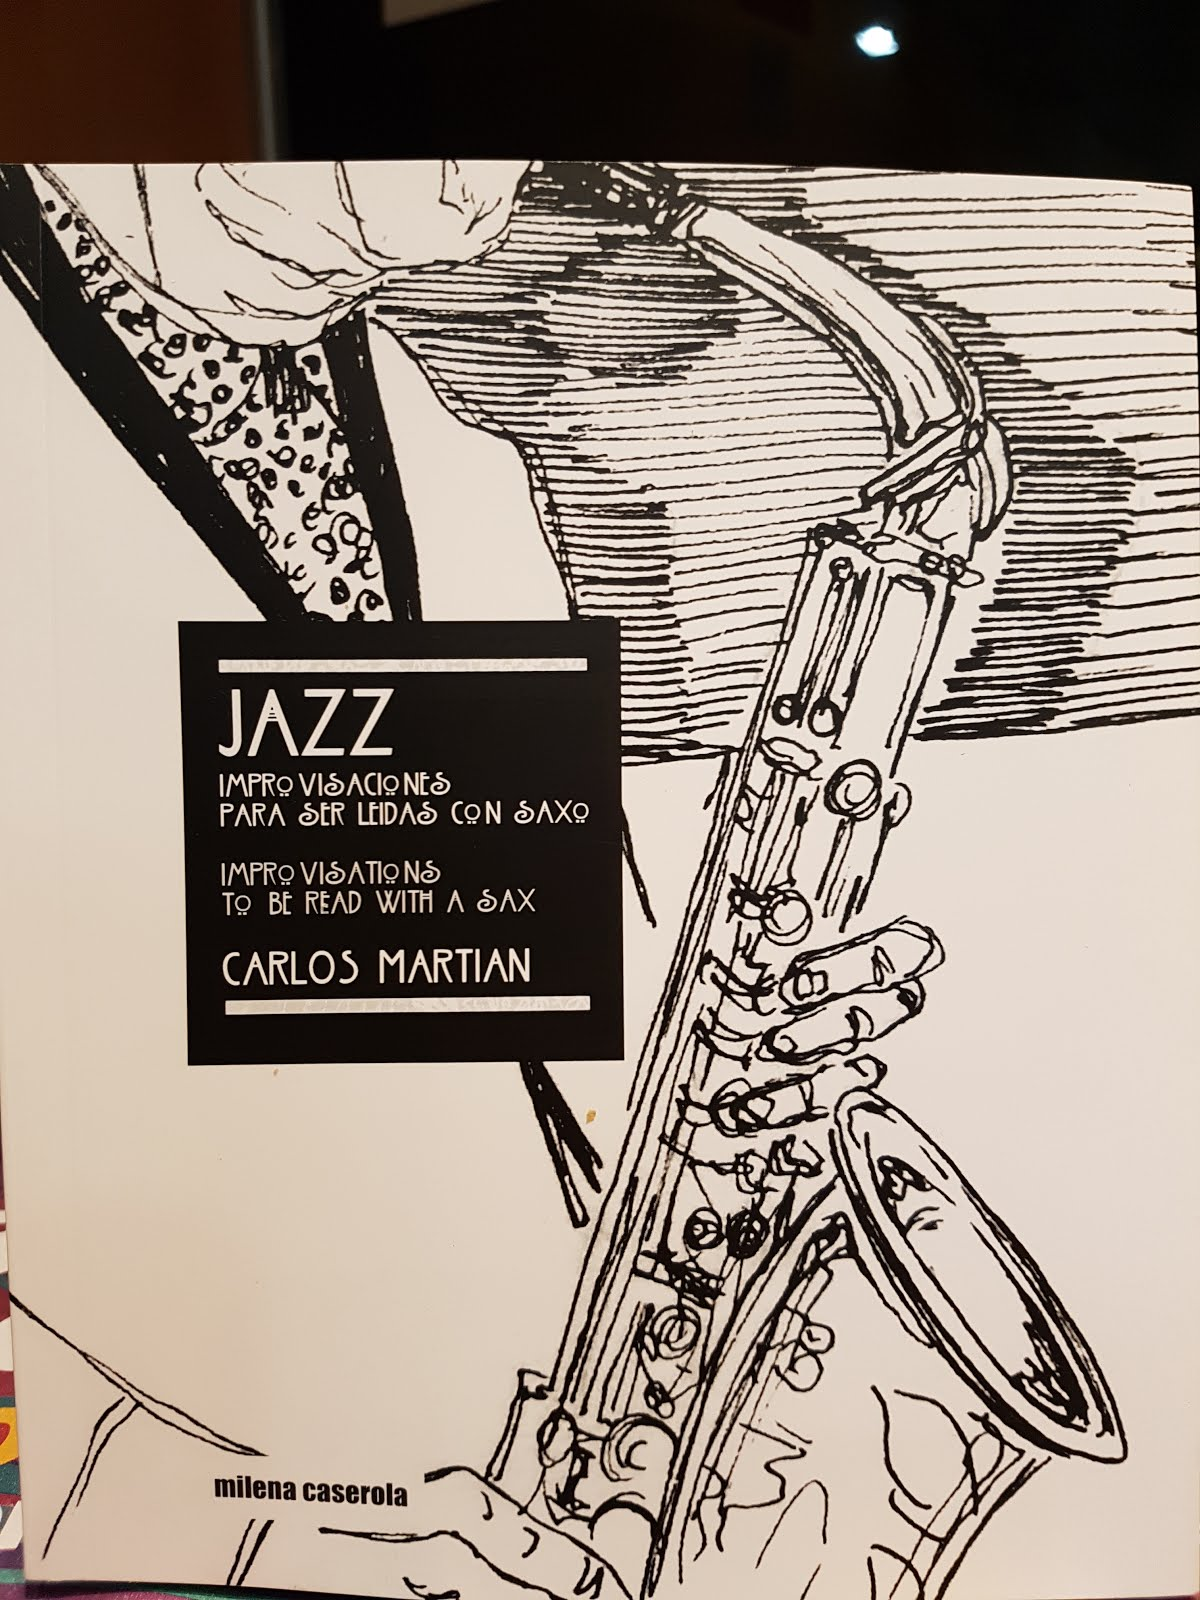 Jazz, Improvisaciones para ser leídas con saxo